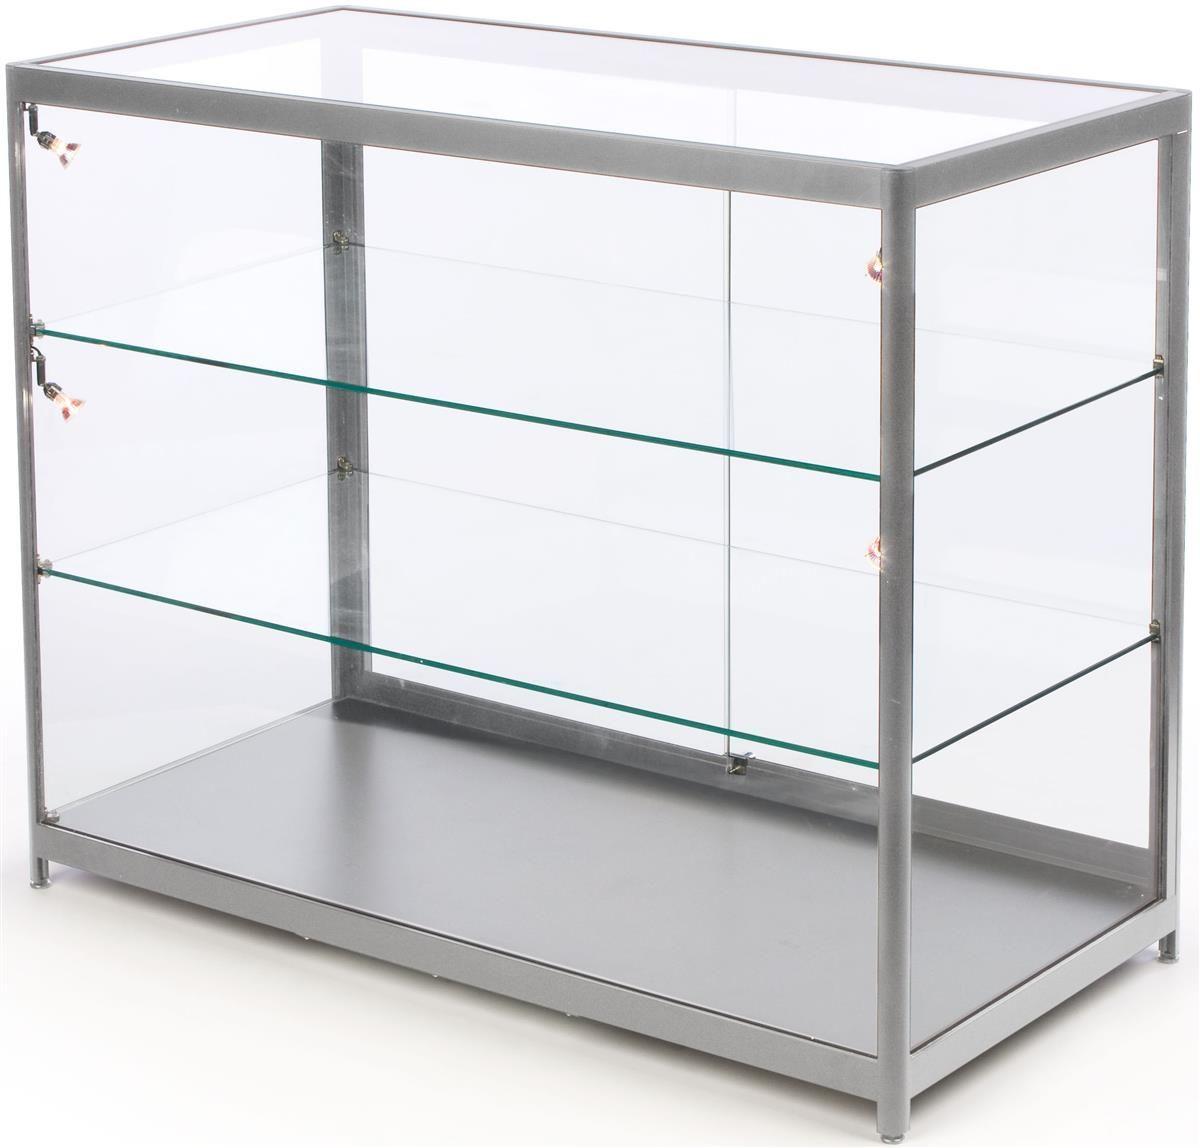 72 Retail Display Counter W 4 Led Lights Sliding Doors Ships Assembled Silver Adjustable Shelving Display Case Glass Display Case